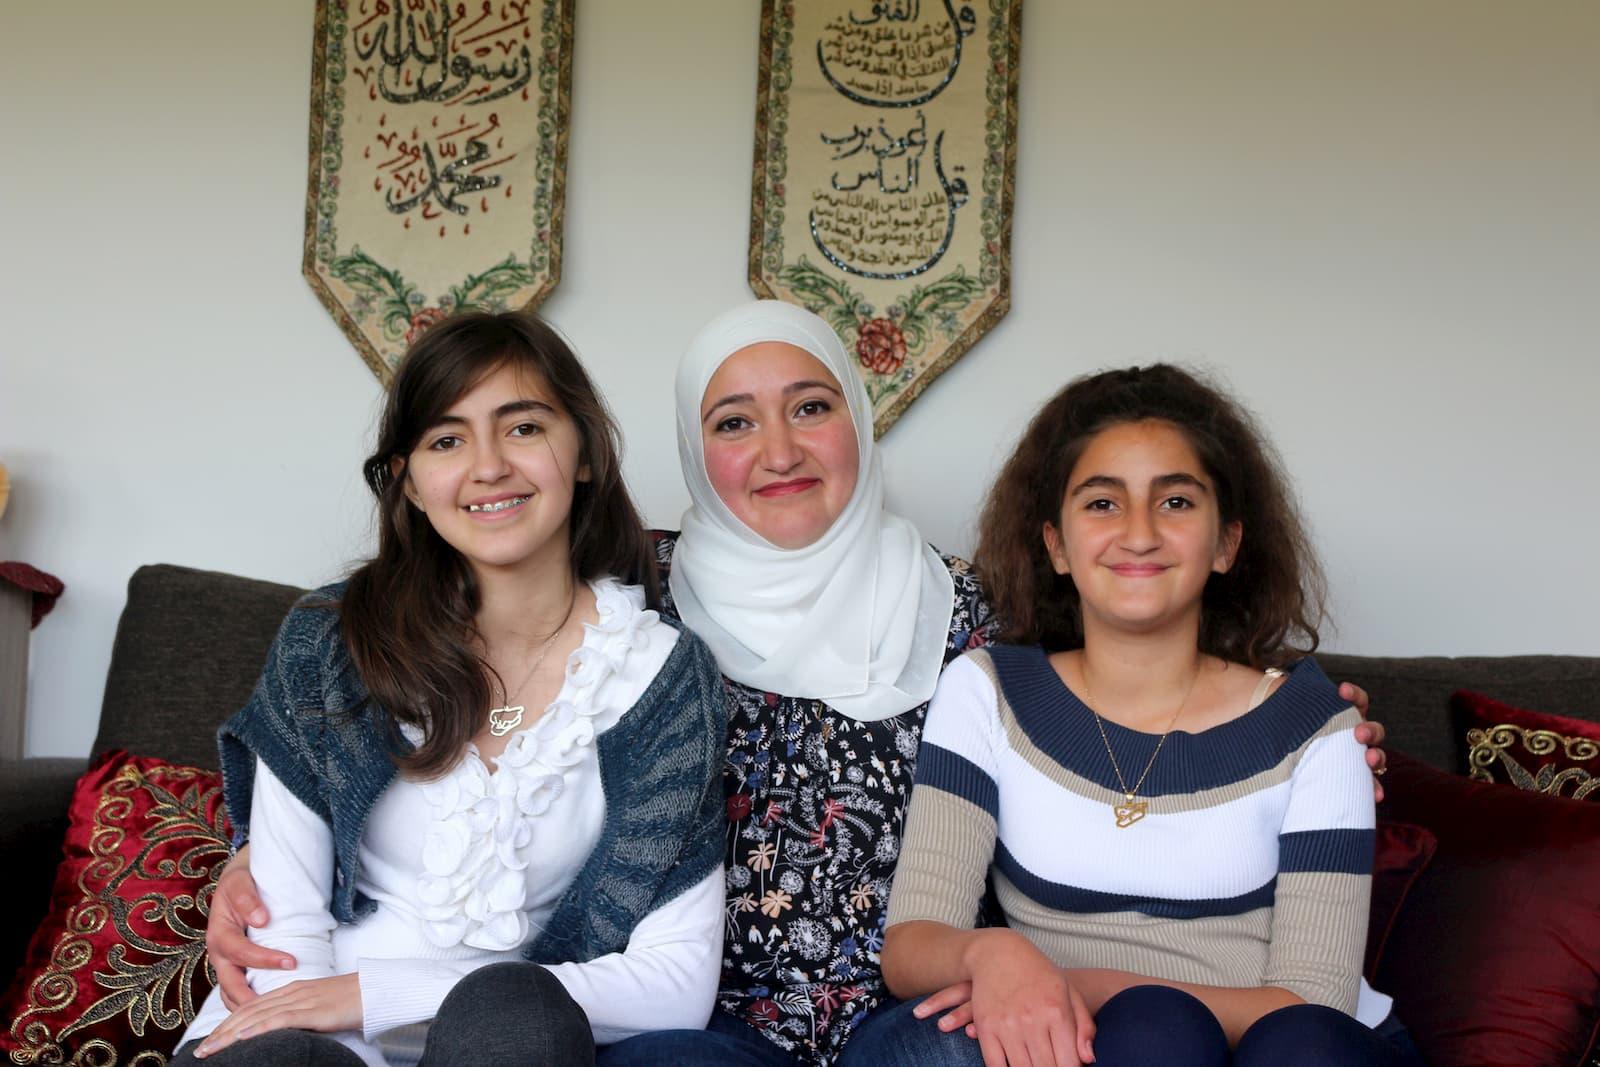 Batool Nakshbandi (14), Ramia Saidawi, and Bayan Nakshbandi (12) (From left to right)